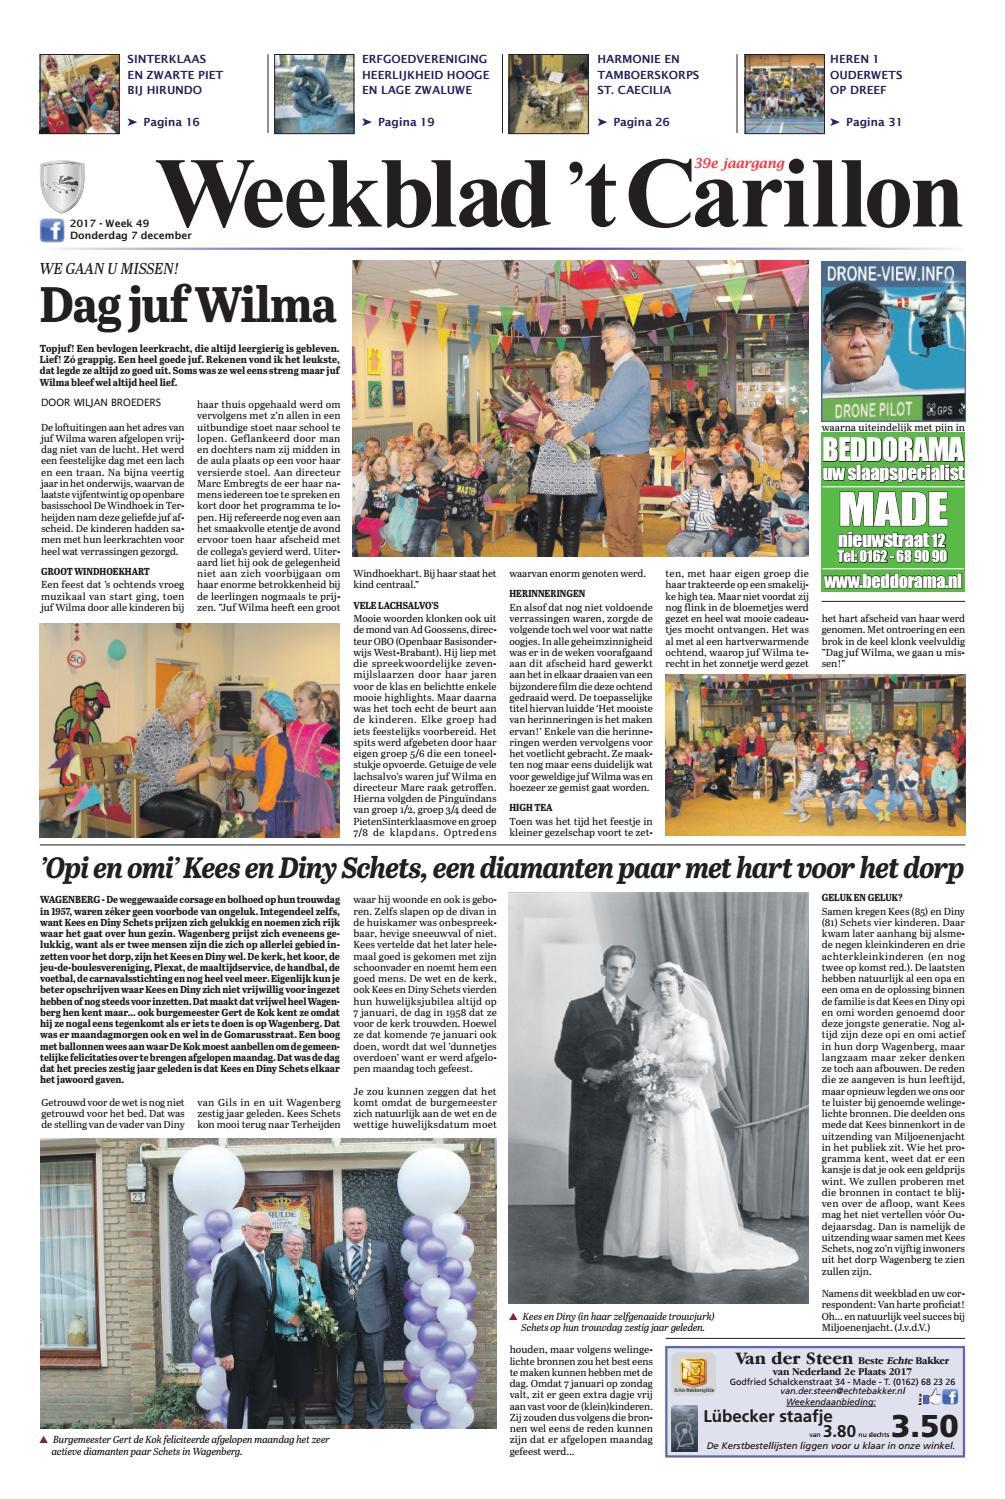 Weekblad  t Carillon 07-12-2017 by Uitgeverij Em de Jong - issuu 604852d41e